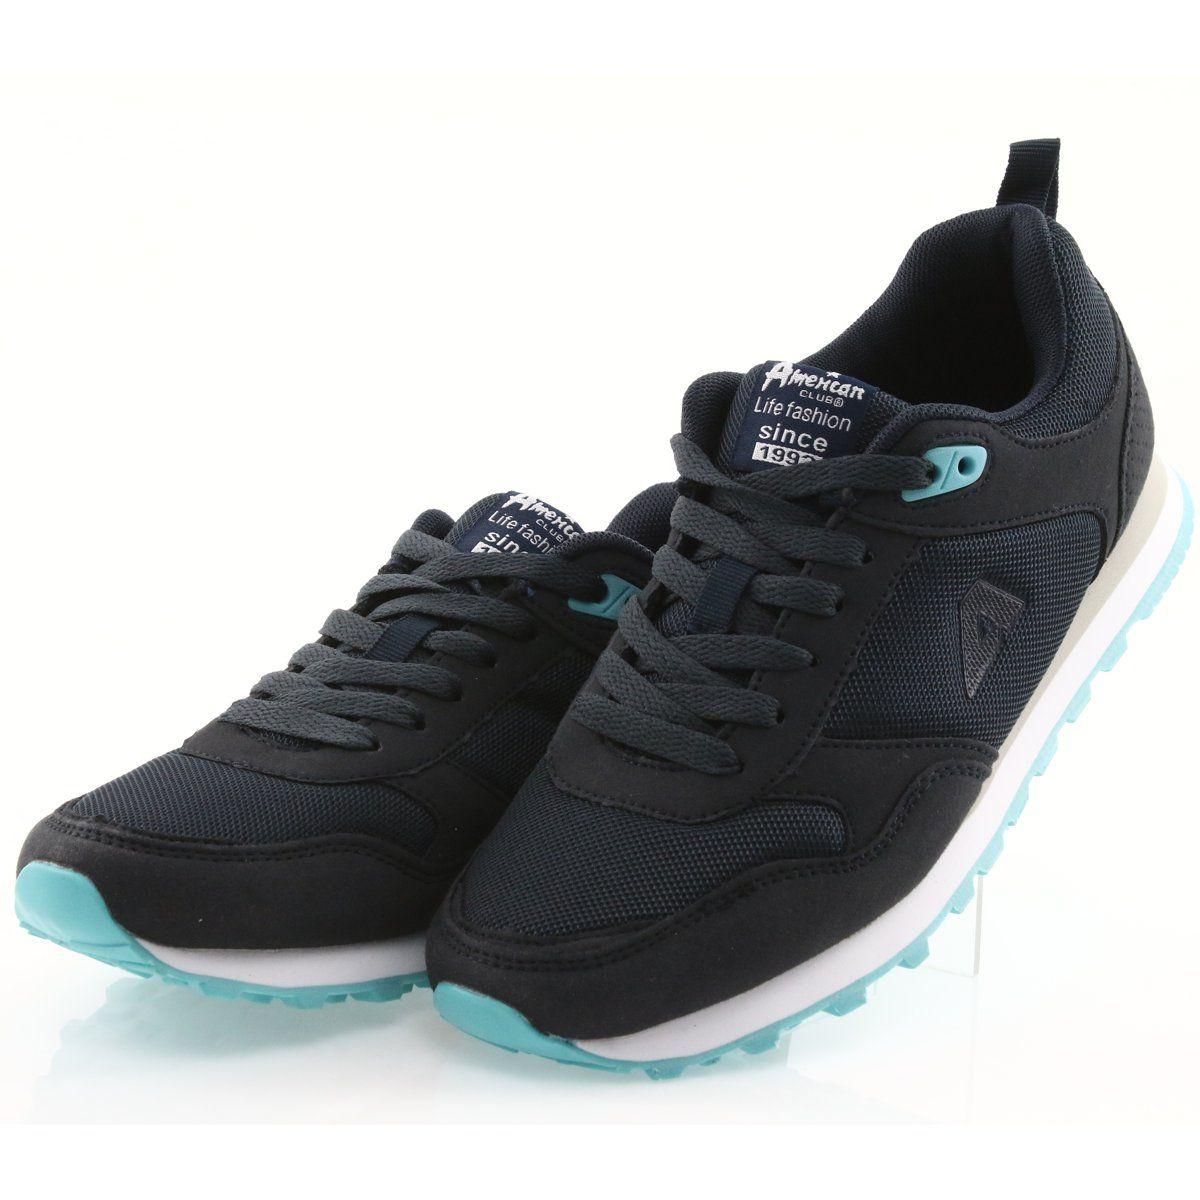 Sportowe Damskie Americanclub Buty Sportowe American Club Wt26 Granatowe Sports Shoes Shoes Women Shoes